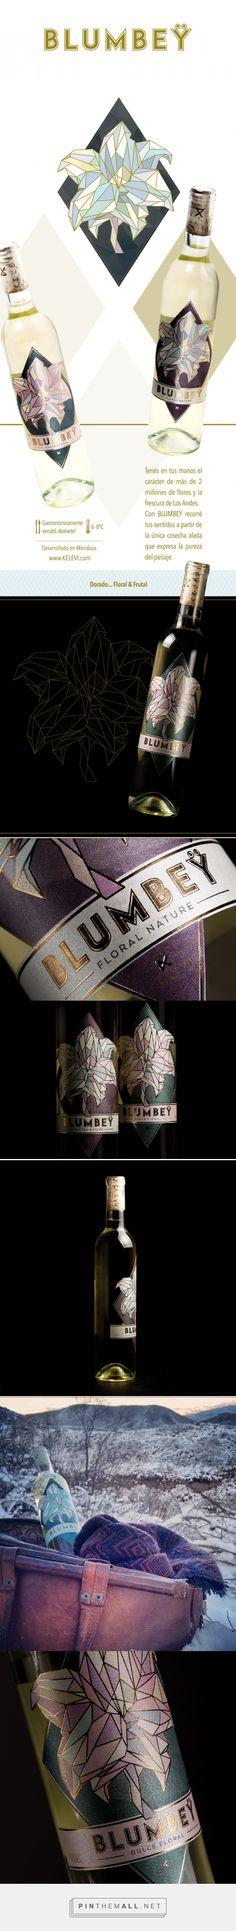 Blumbey Wine Packaging by Estudio Argo | Fivestar Branding Agency – Design and Branding Agency & Curated Inspiration Gallery #winepackaging #packagingdesign #packaging #designinspirations #fivestarbrandingagency